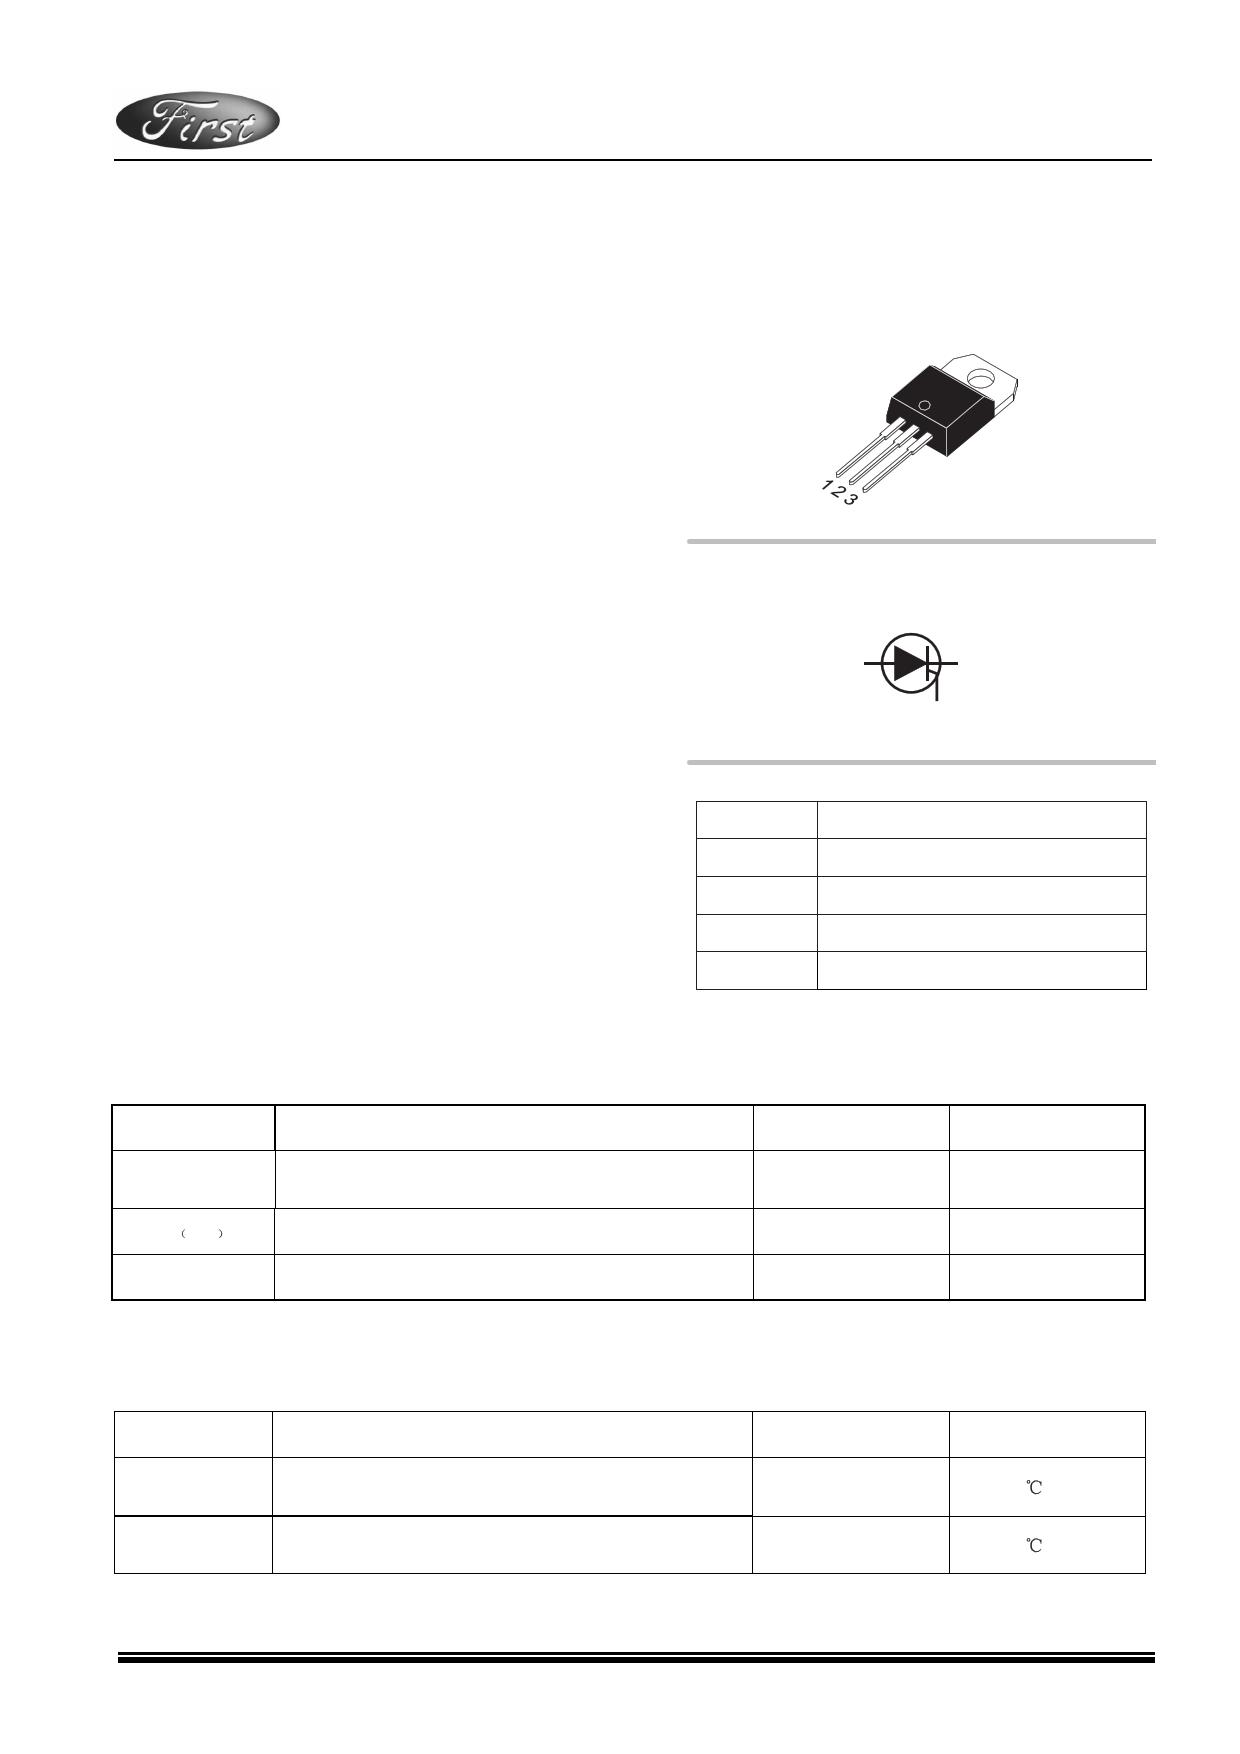 TS820-800TG Datasheet